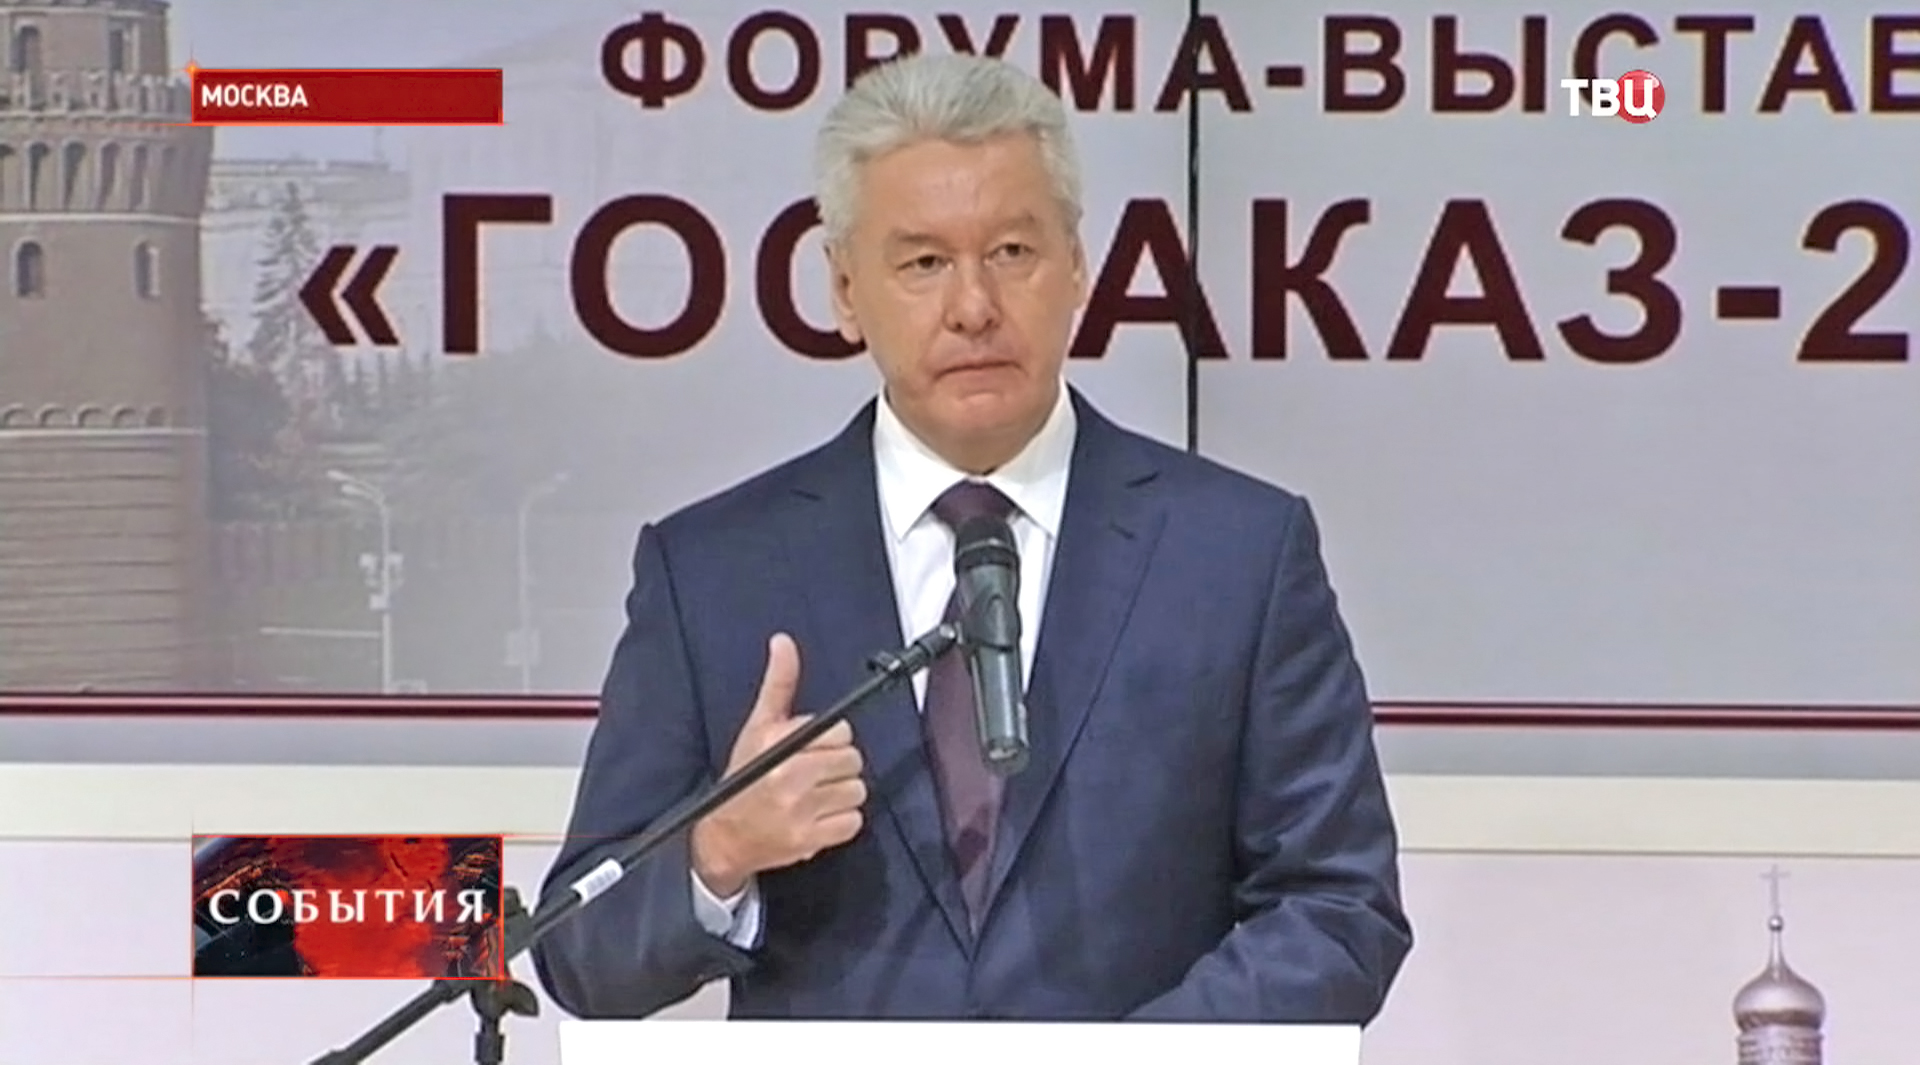 Сергей Собянин на форуме